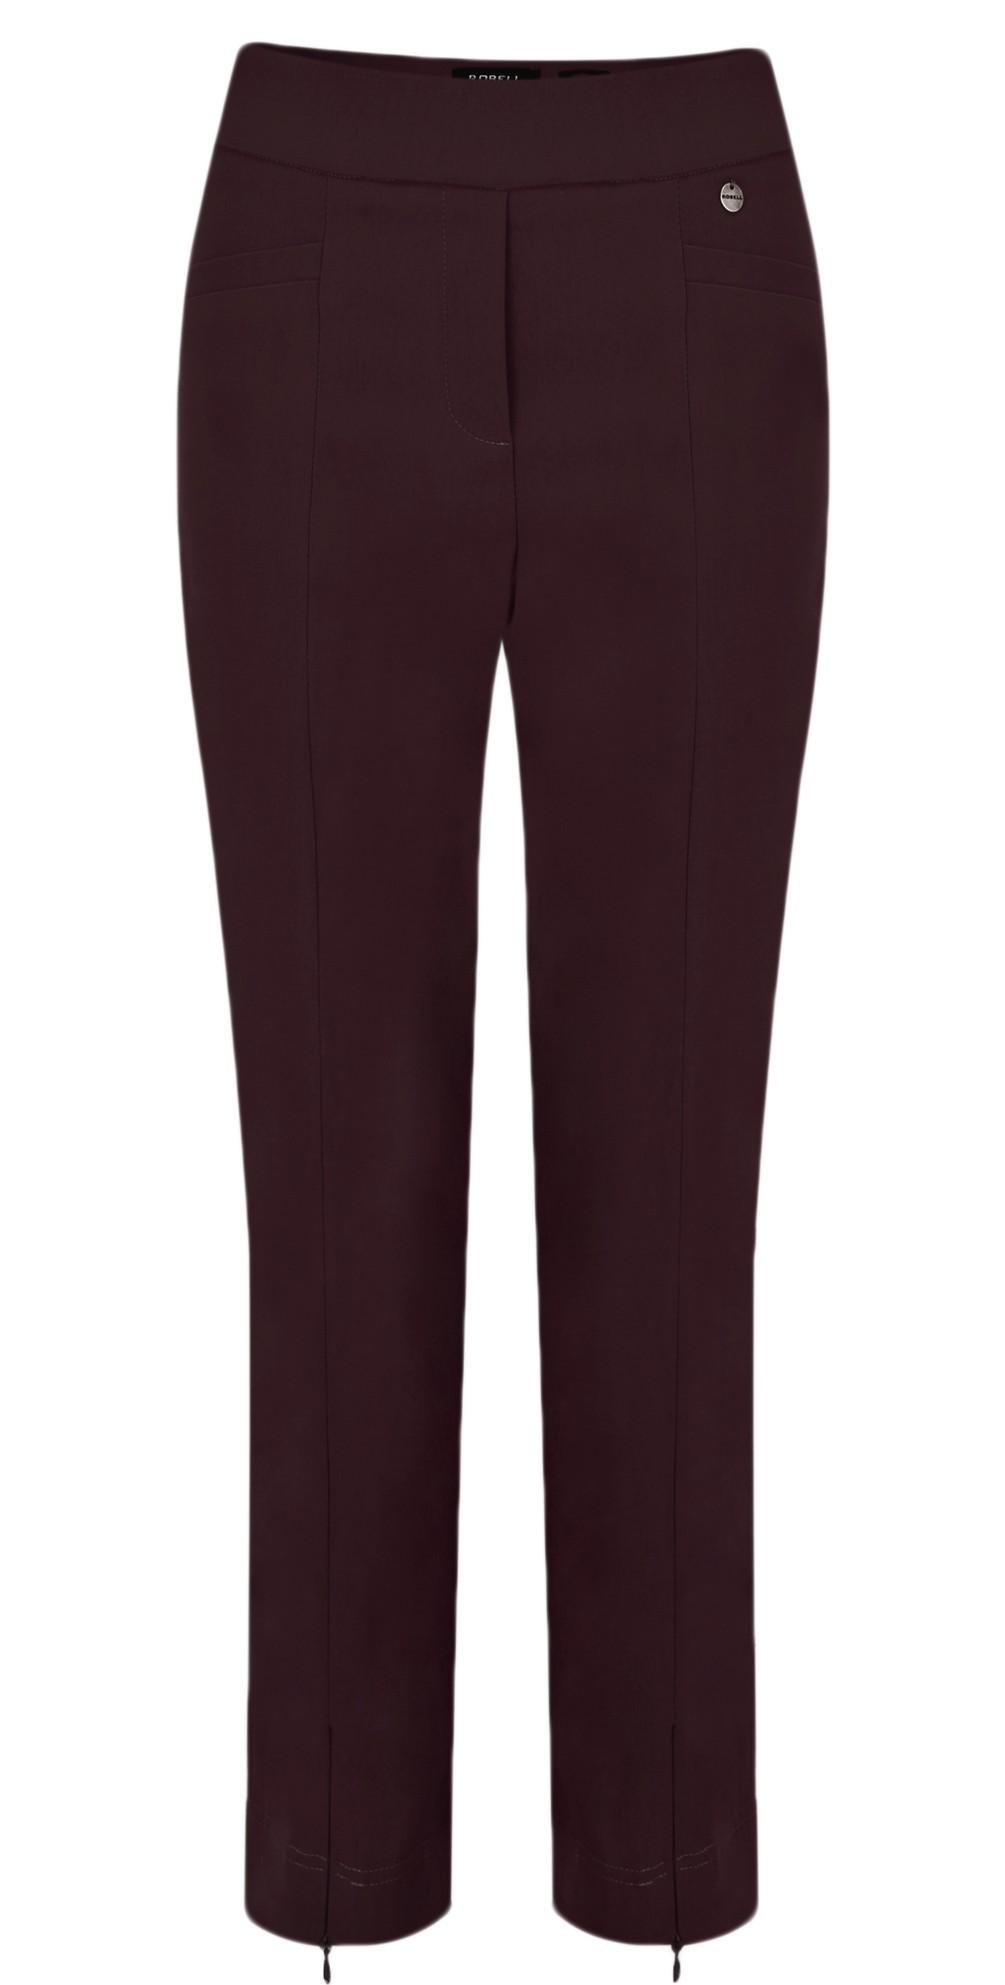 Nena 09 Aubergine Slimfit Fleece Lined Ankle Length Trouser main image